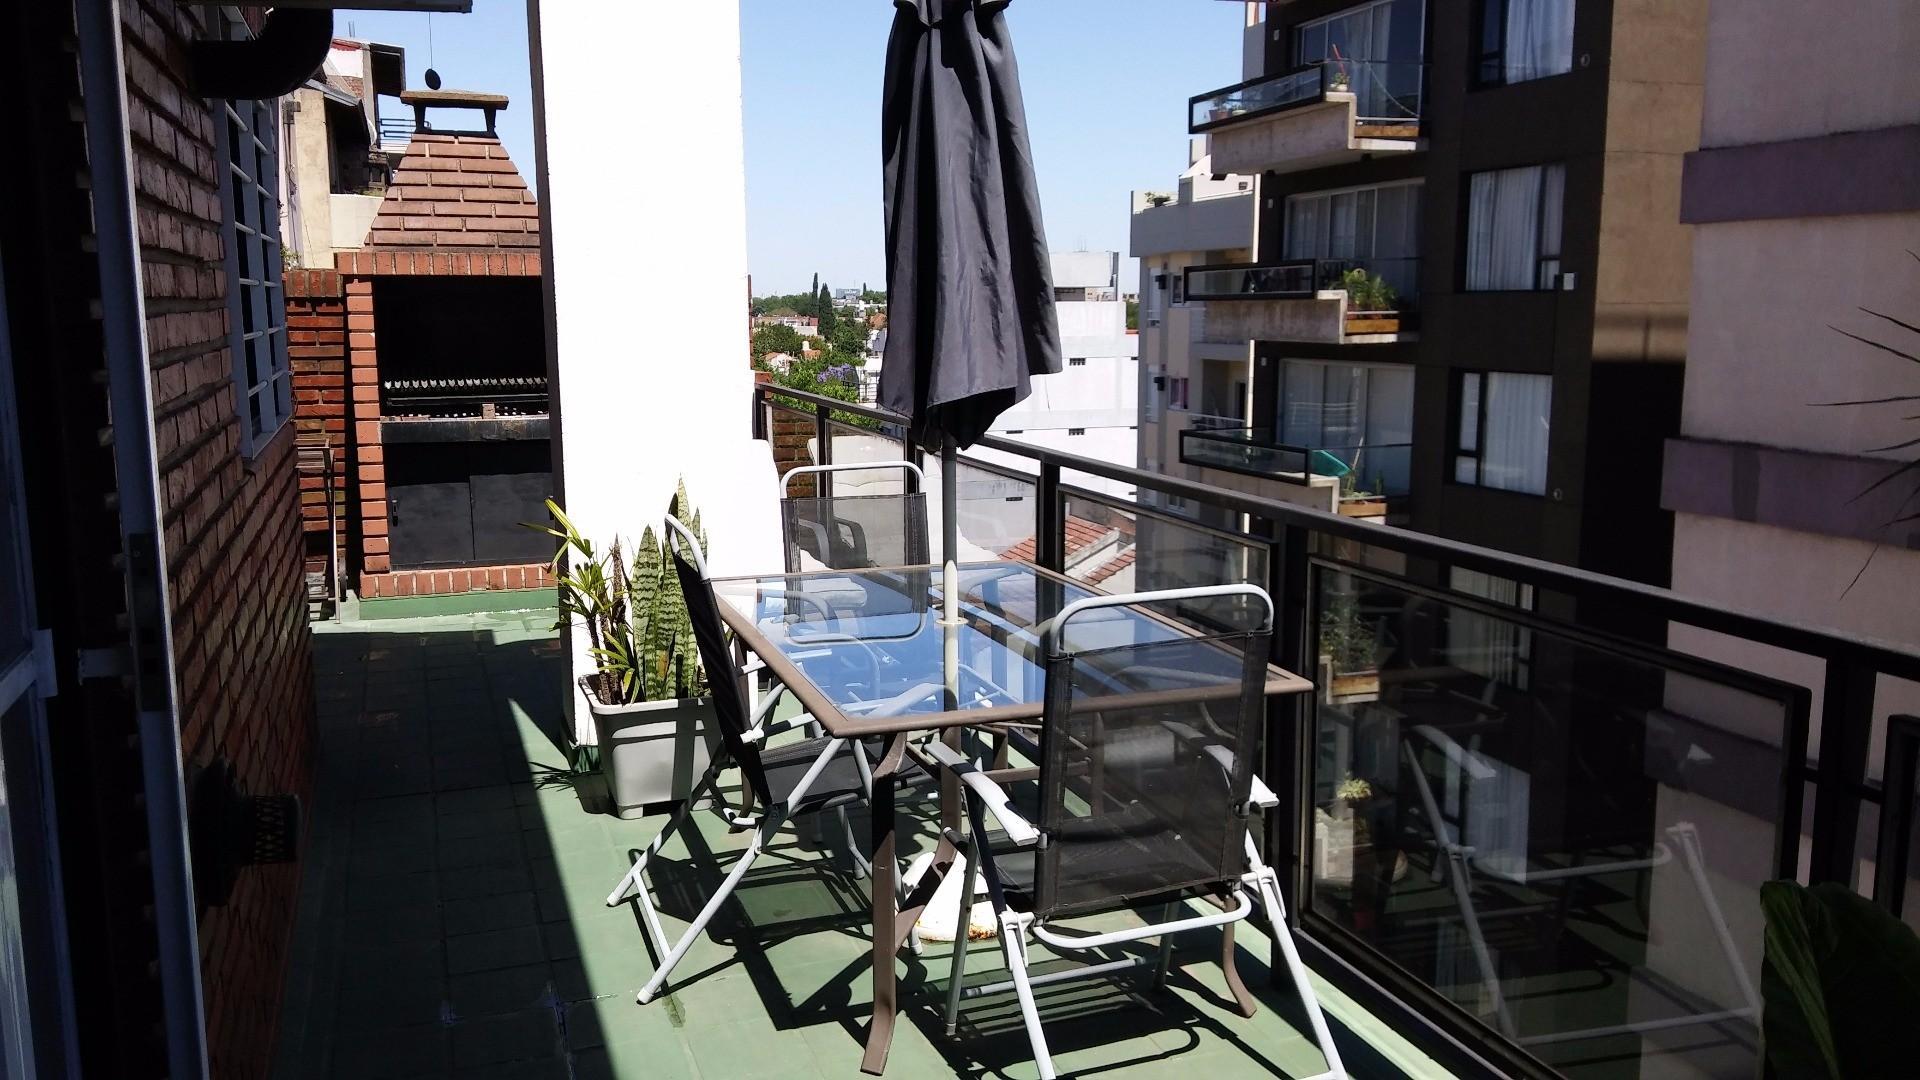 Florida - Mármol 1549 P.6 -  Semipiso 2 amb. contrafrente con balcón terraza y parrilla